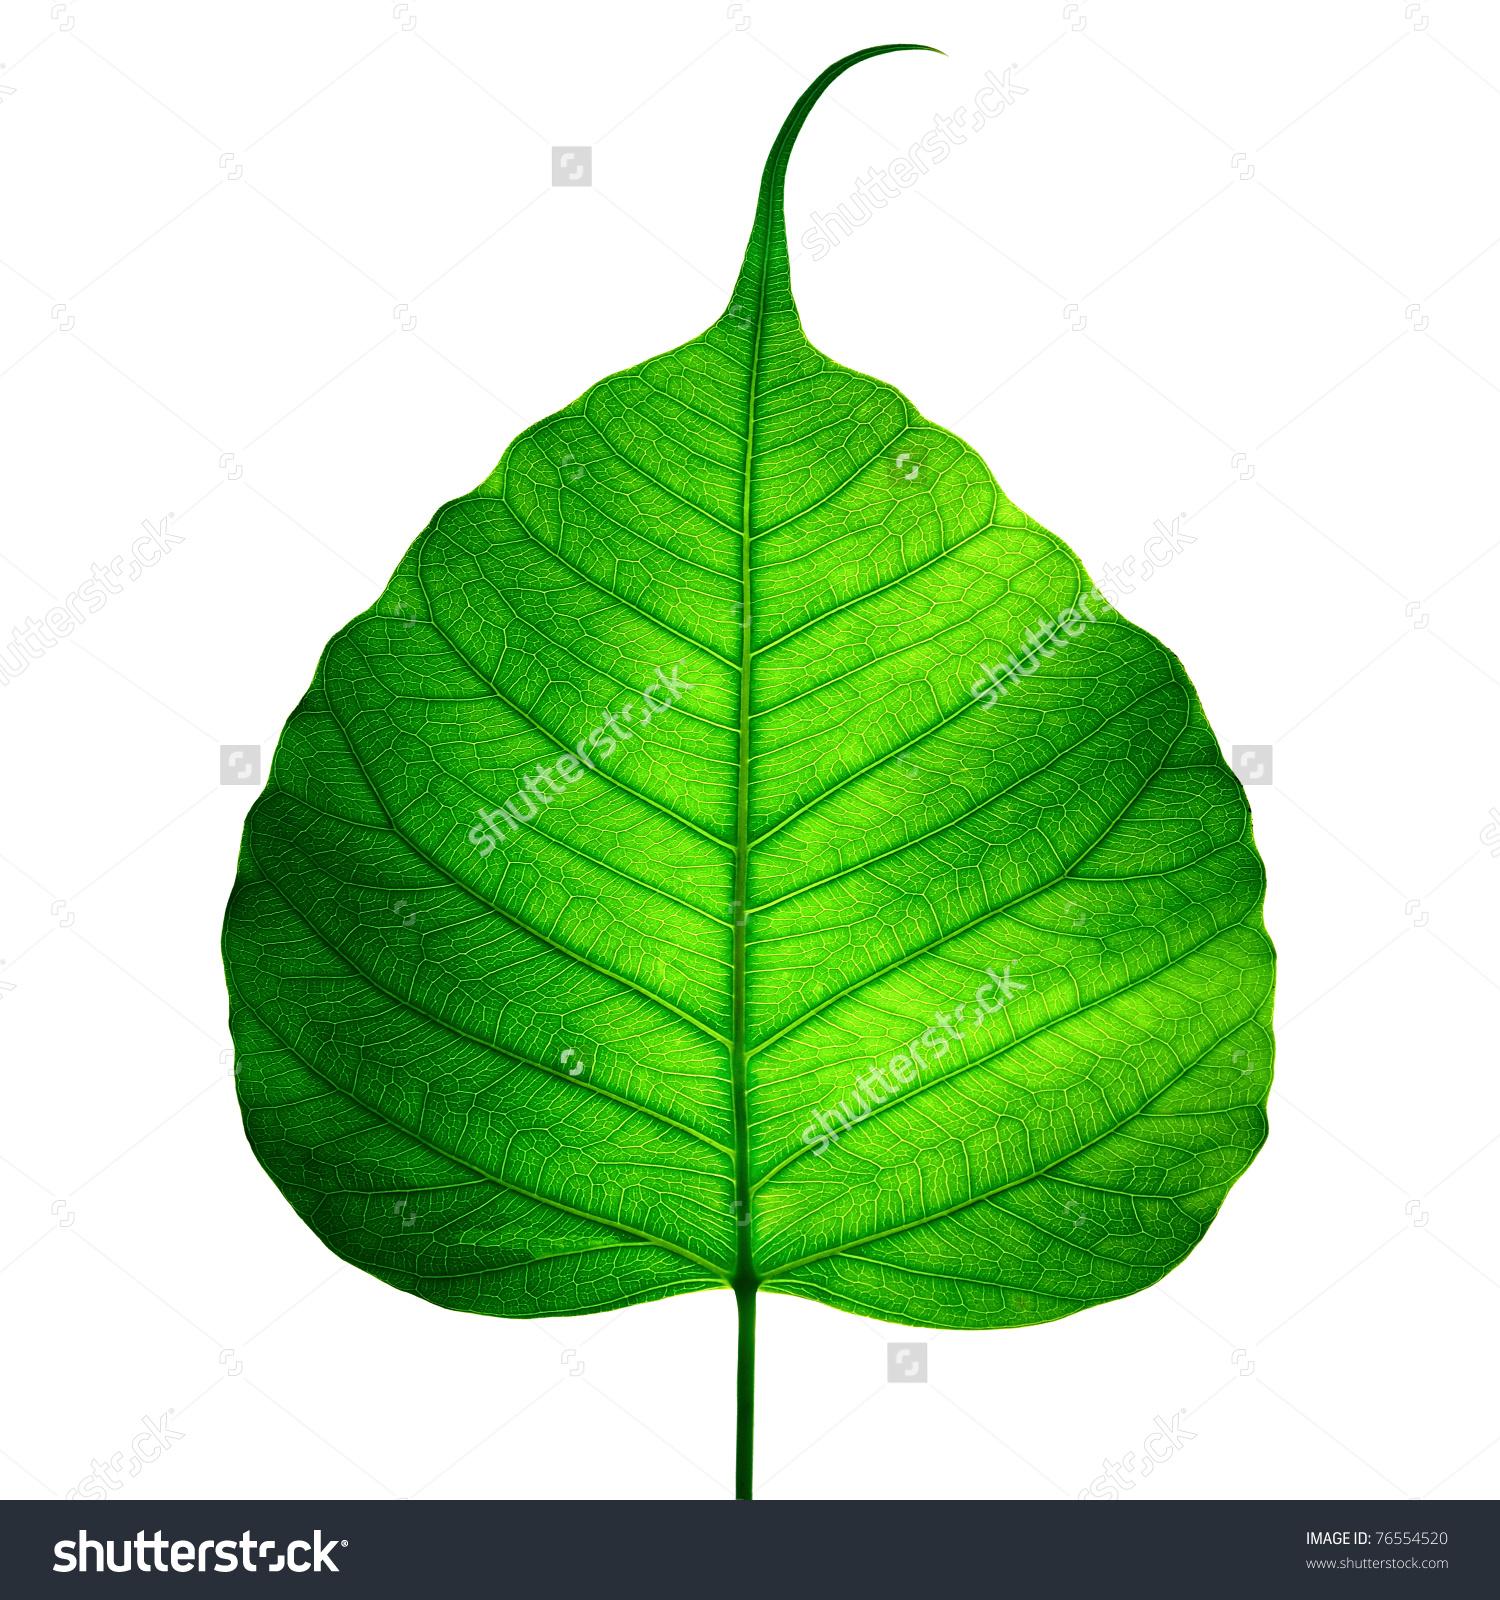 Green Leaf Vein Bodhi Leaf On Stock Photo 76554520.